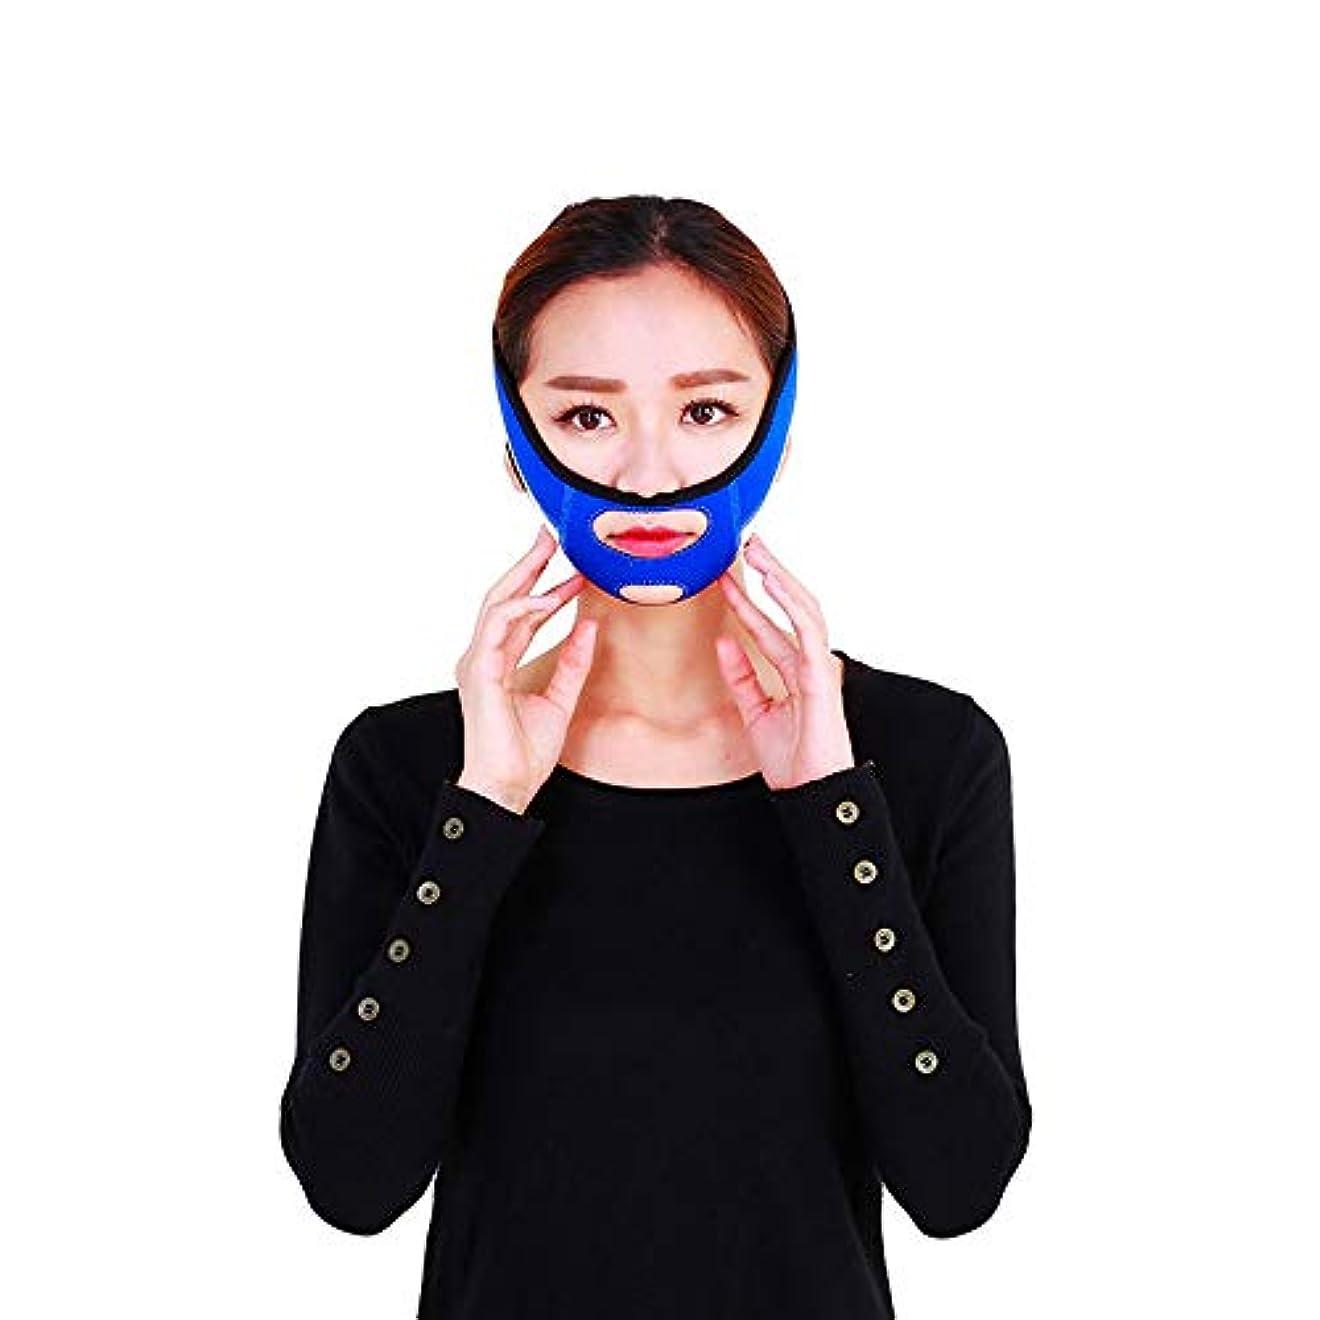 GYZ フェイシャルリフティング痩身ベルトフェーススリム二重あごを取り除くアンチエイジングリンクルフェイス包帯マスク整形マスクが顔を引き締める Thin Face Belt